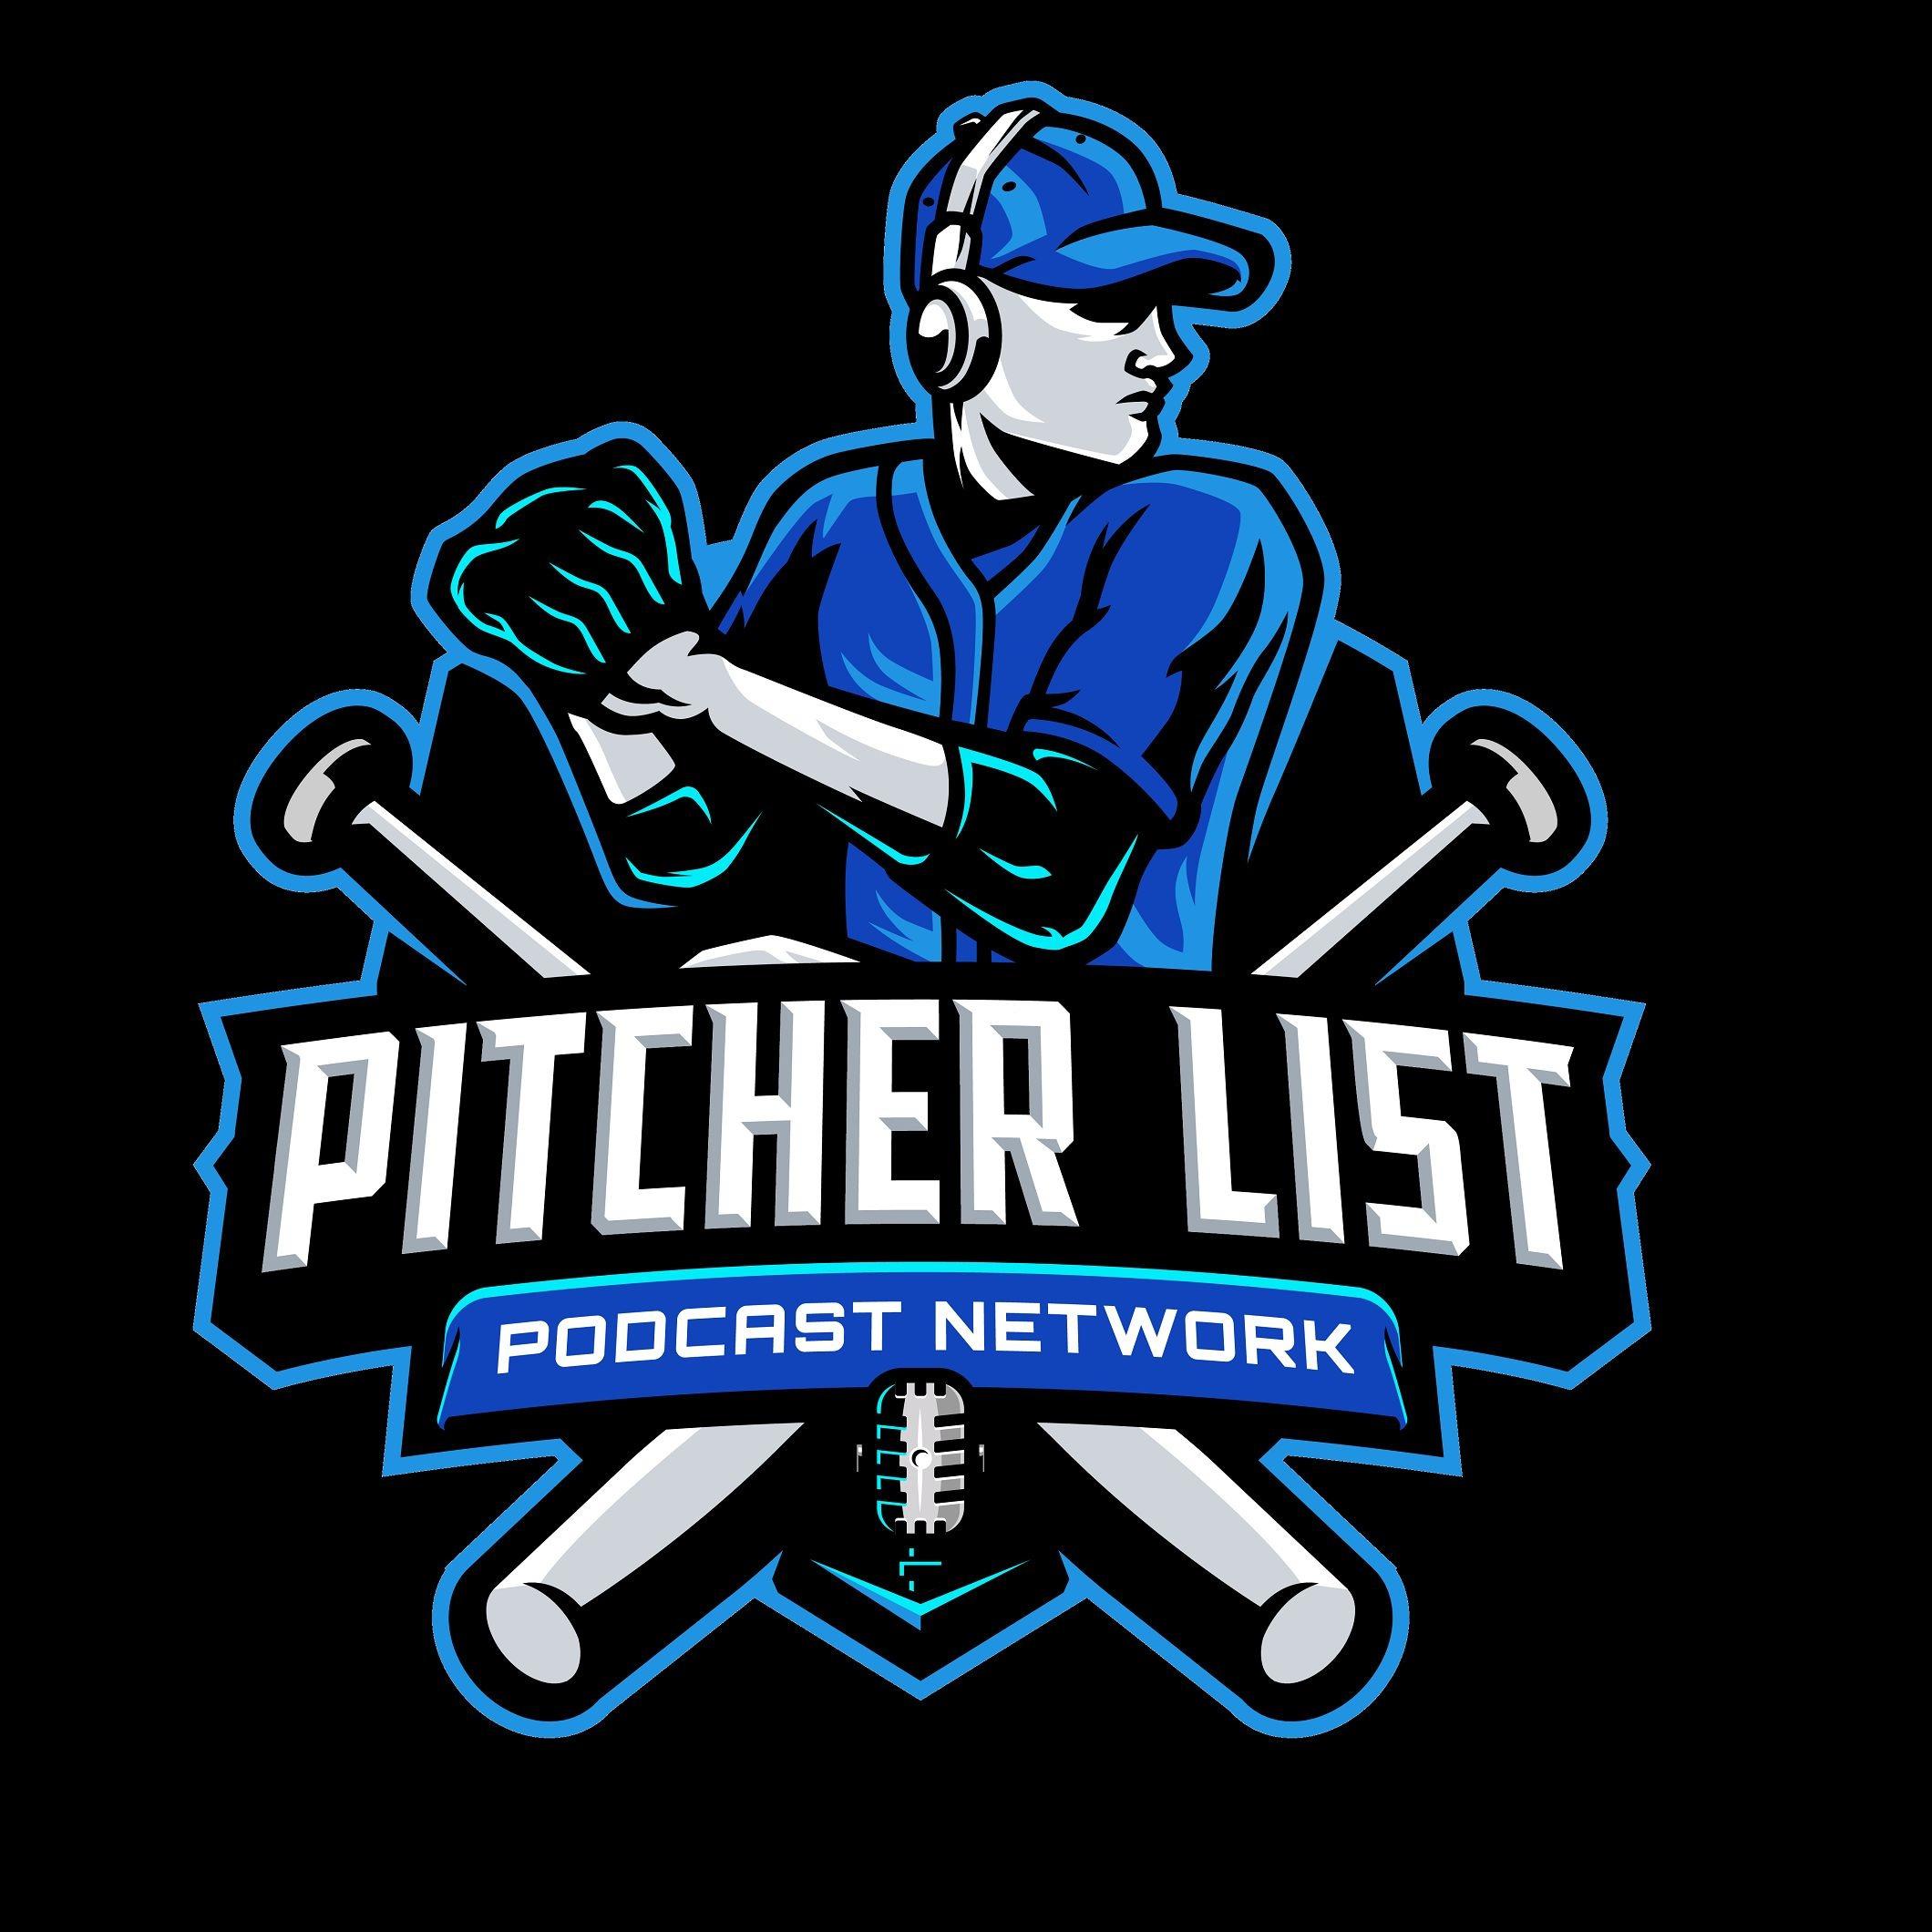 Pitcher List Fantasy Baseball Podcast